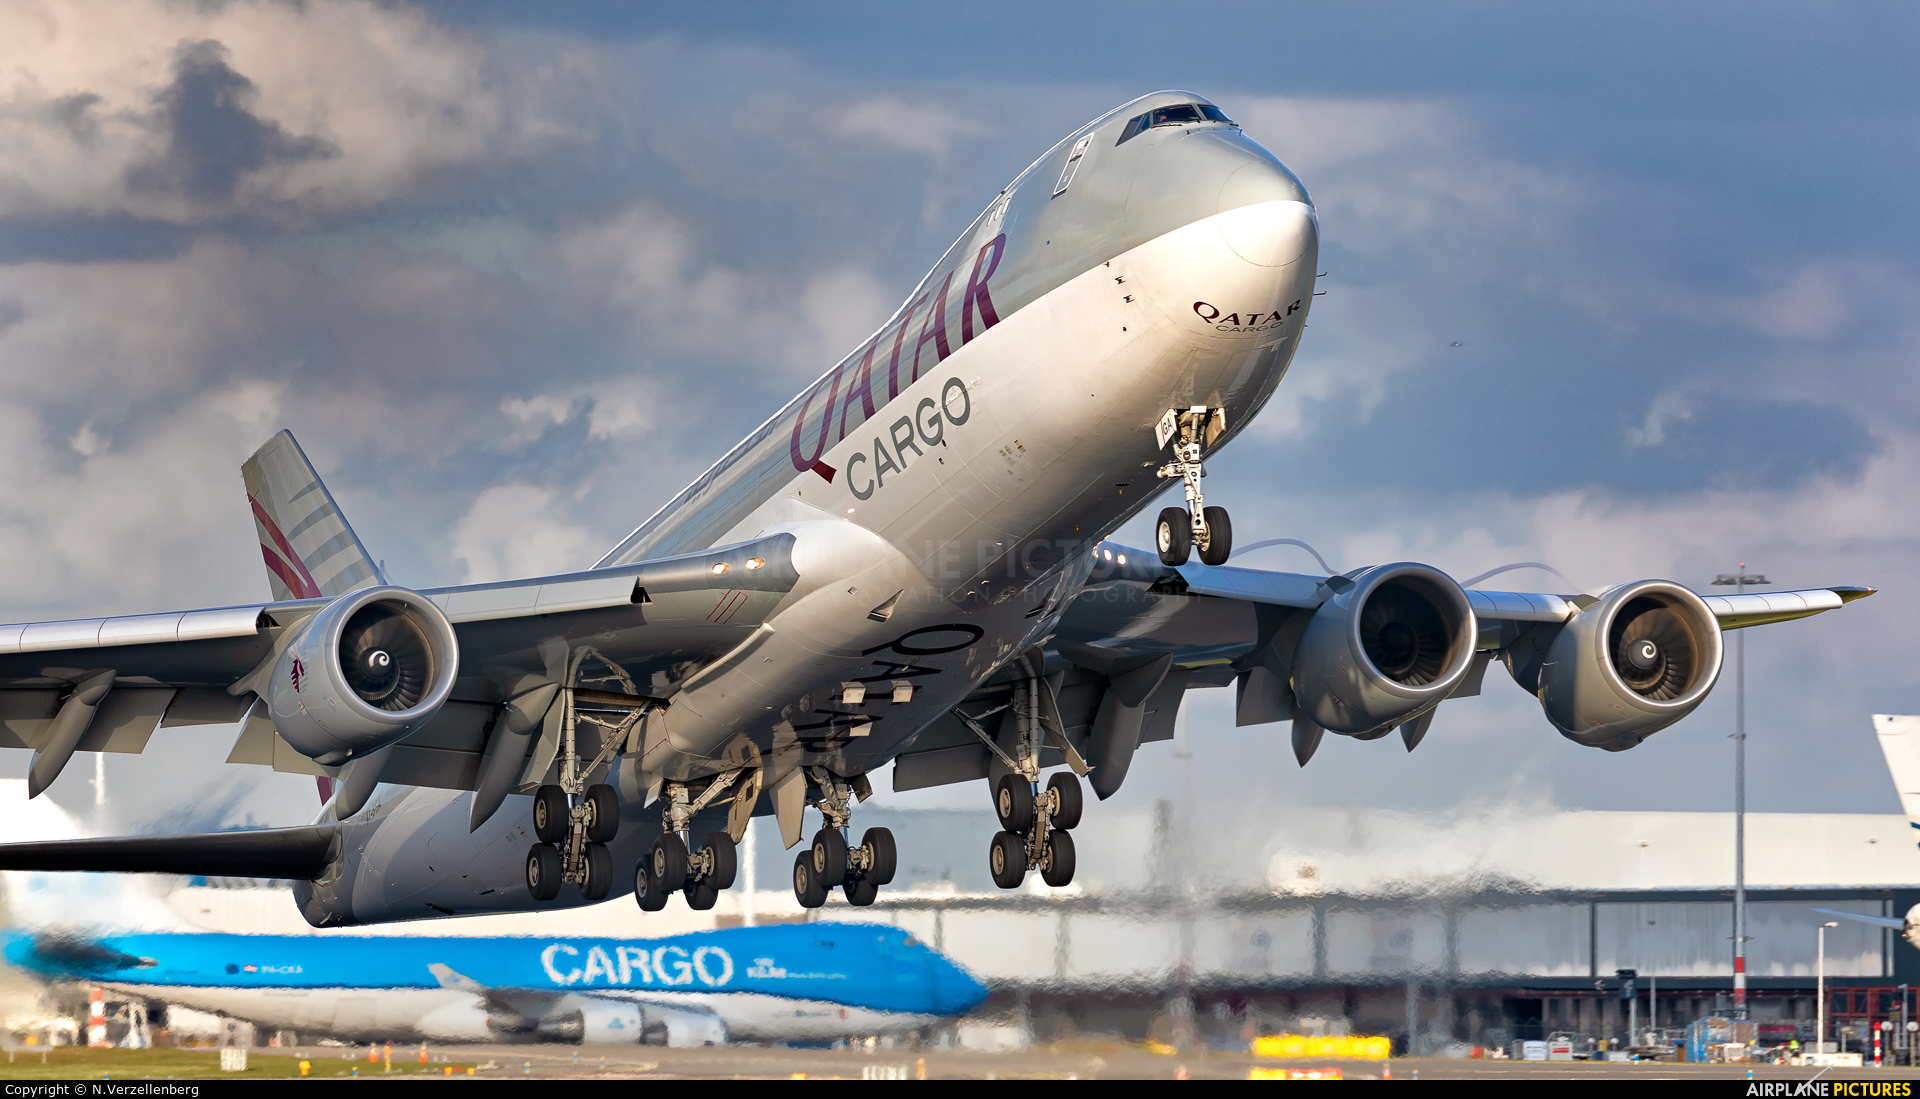 Qatar Airways Cargo A7-BGA aircraft at Amsterdam - Schiphol